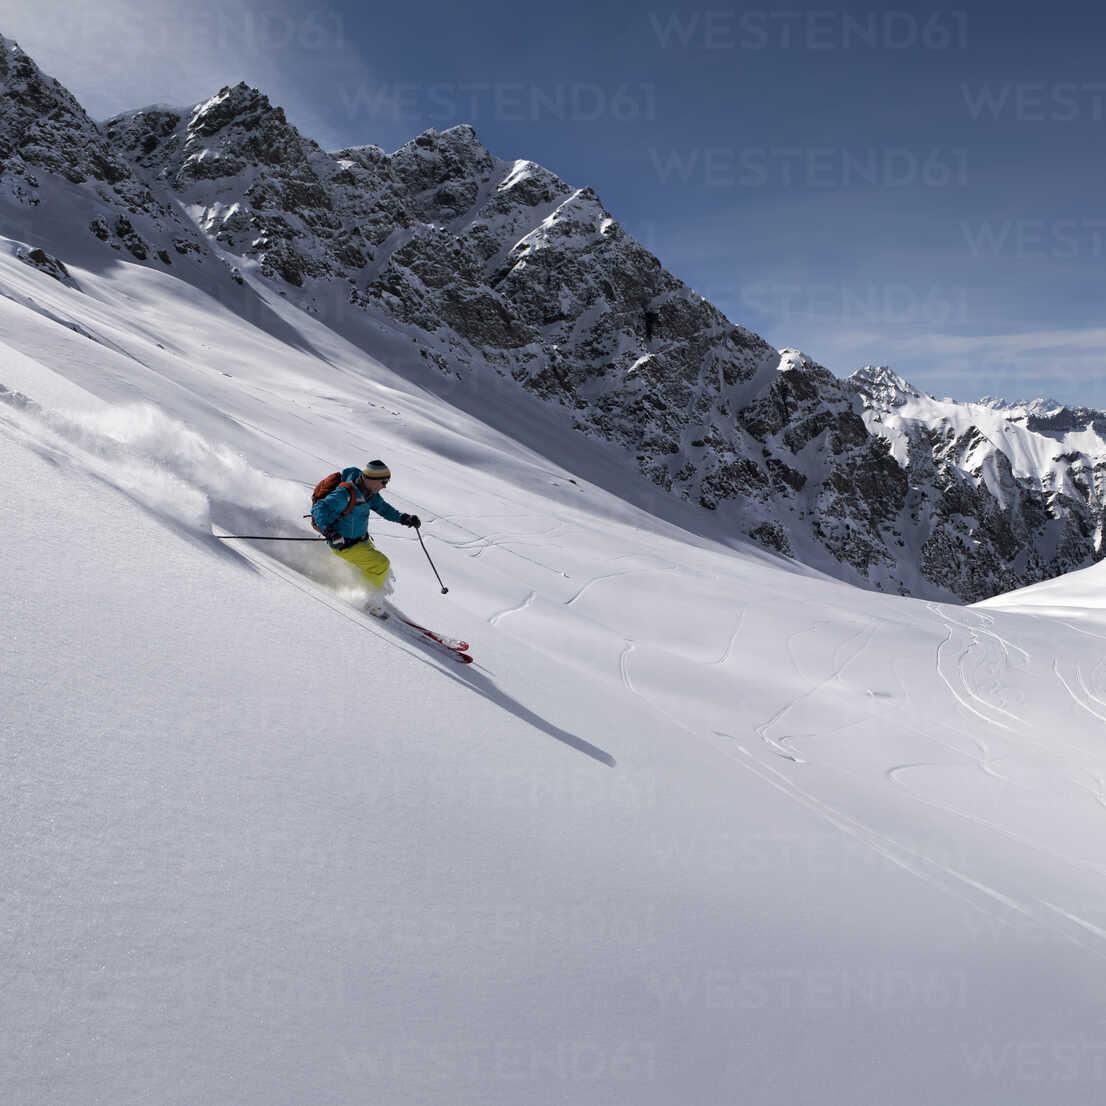 France, Hautes Alpes, Queyras Nature Park, Saint Veran, Tete de Longet, ski mountaineering - ALRF000456 - Alun Richardson/Westend61